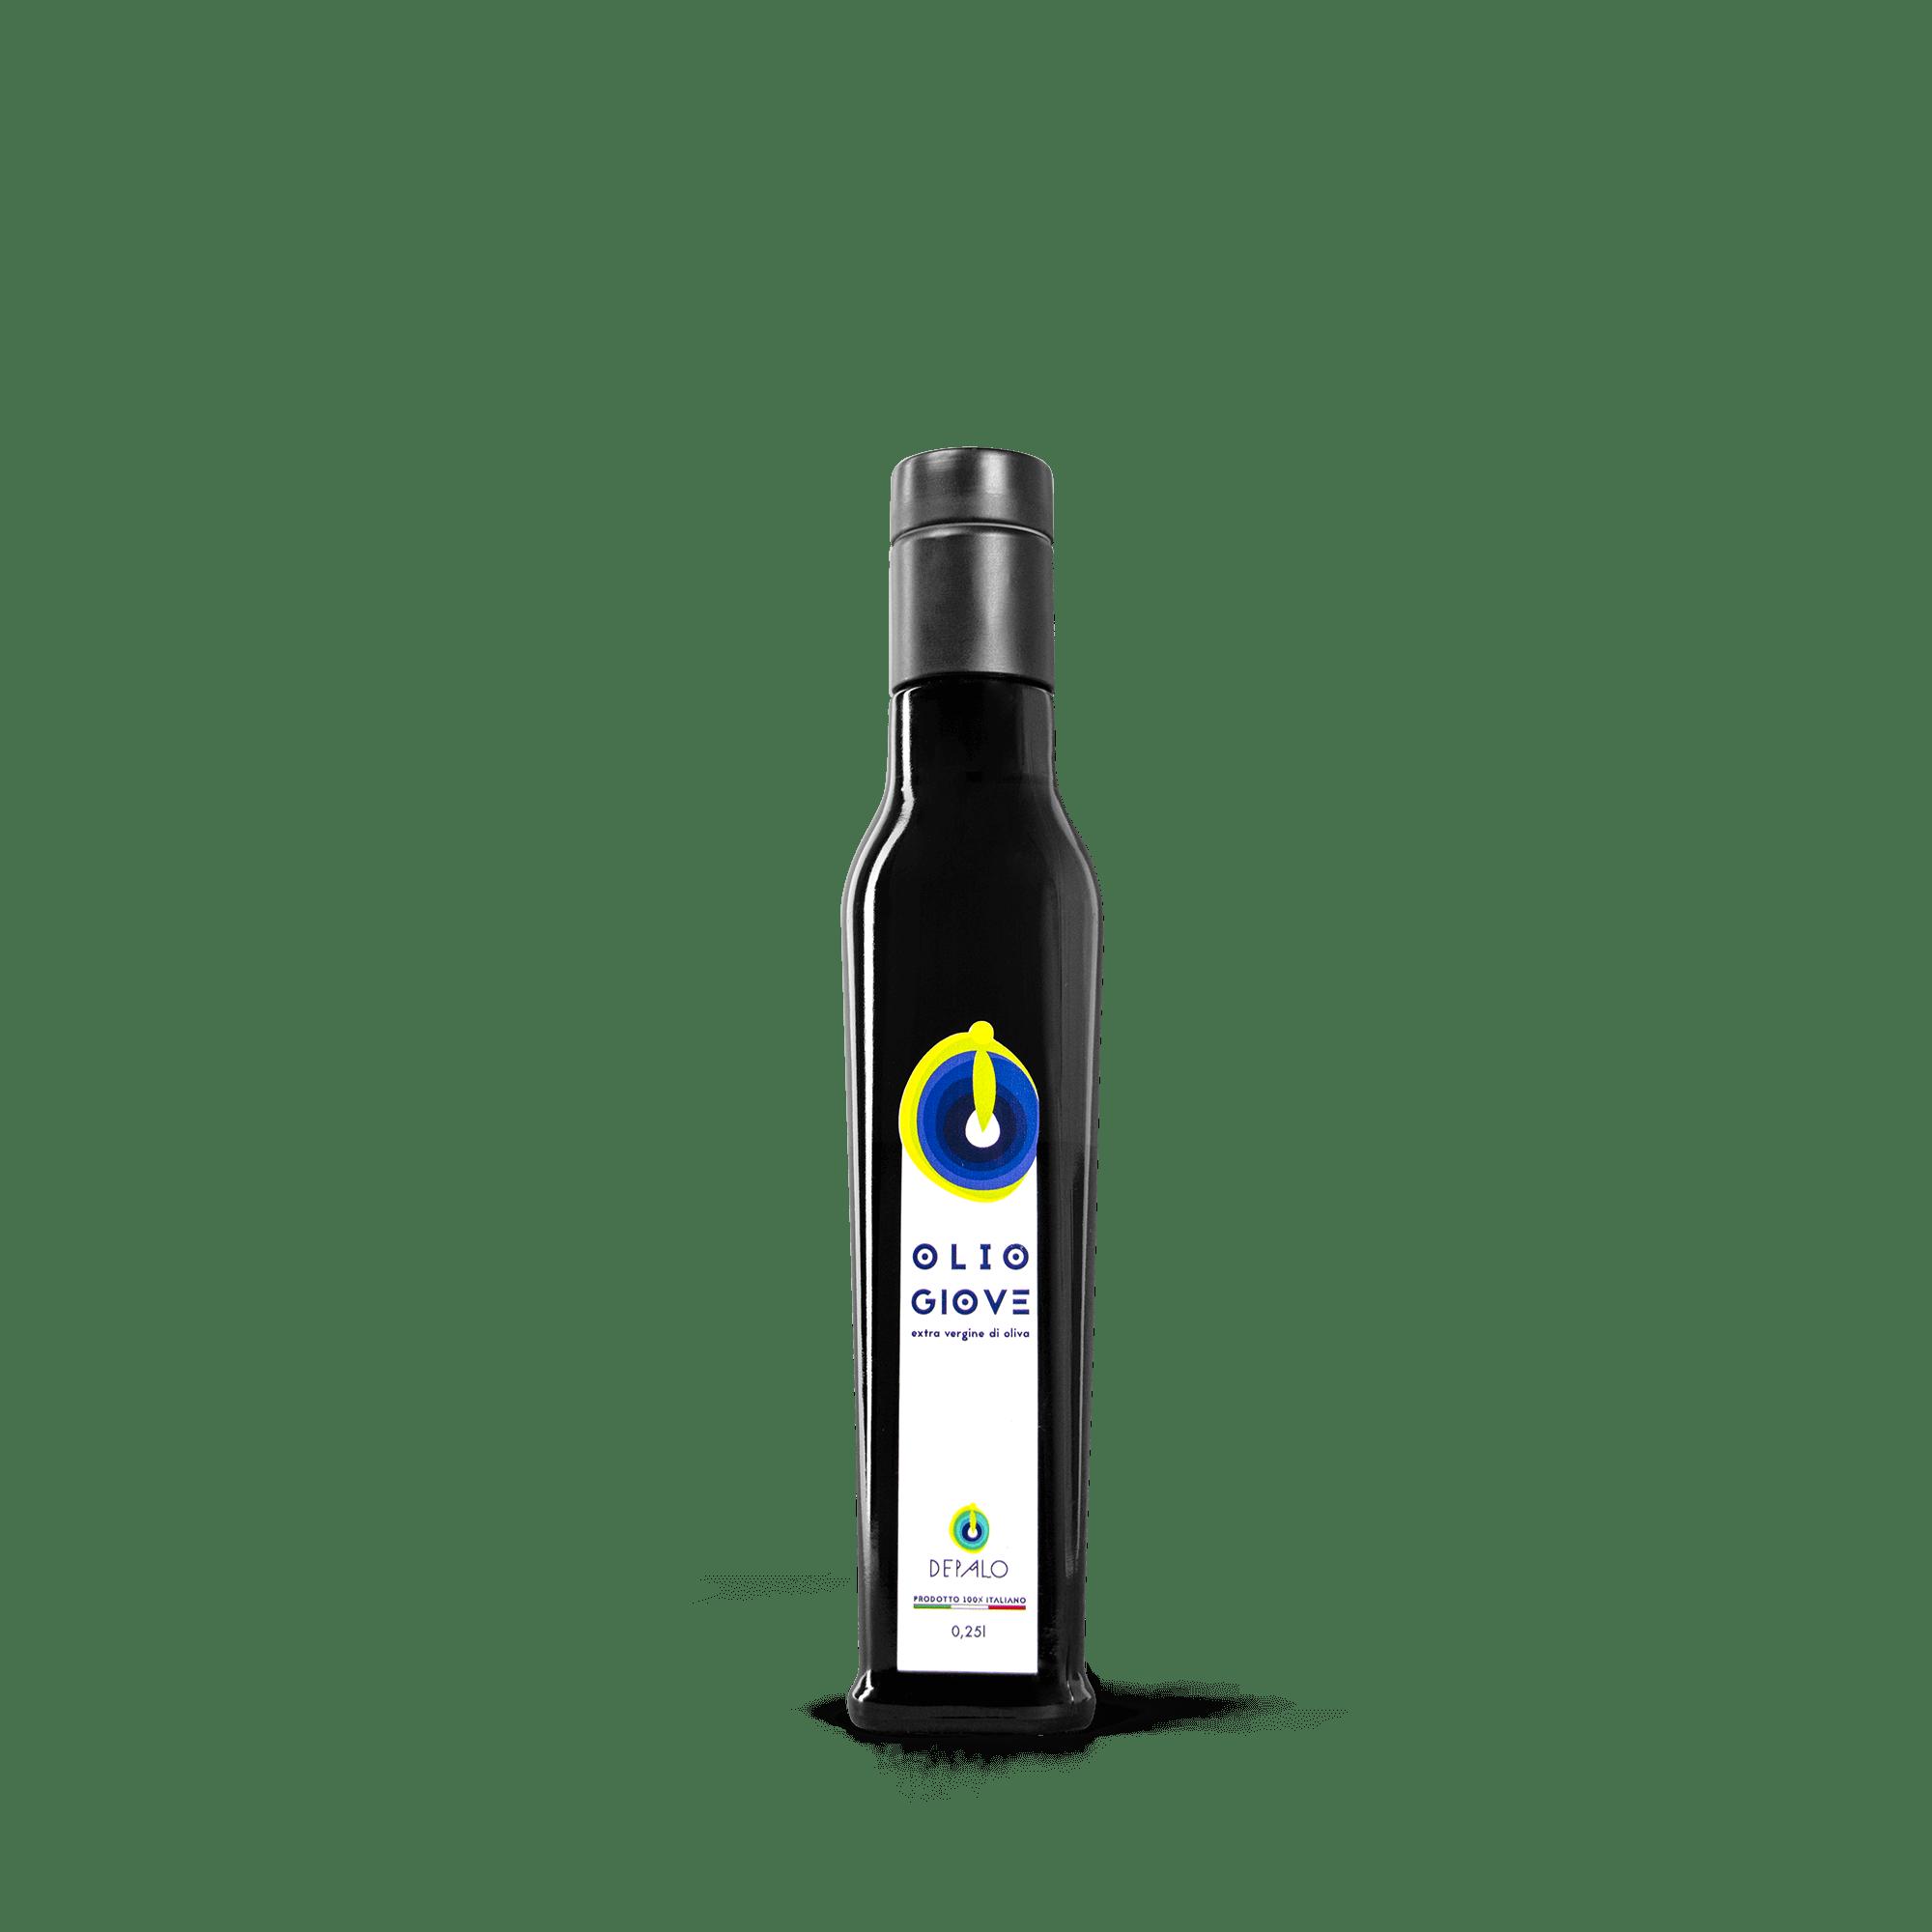 Giove olio extravergine di oliva coratina olio depalo